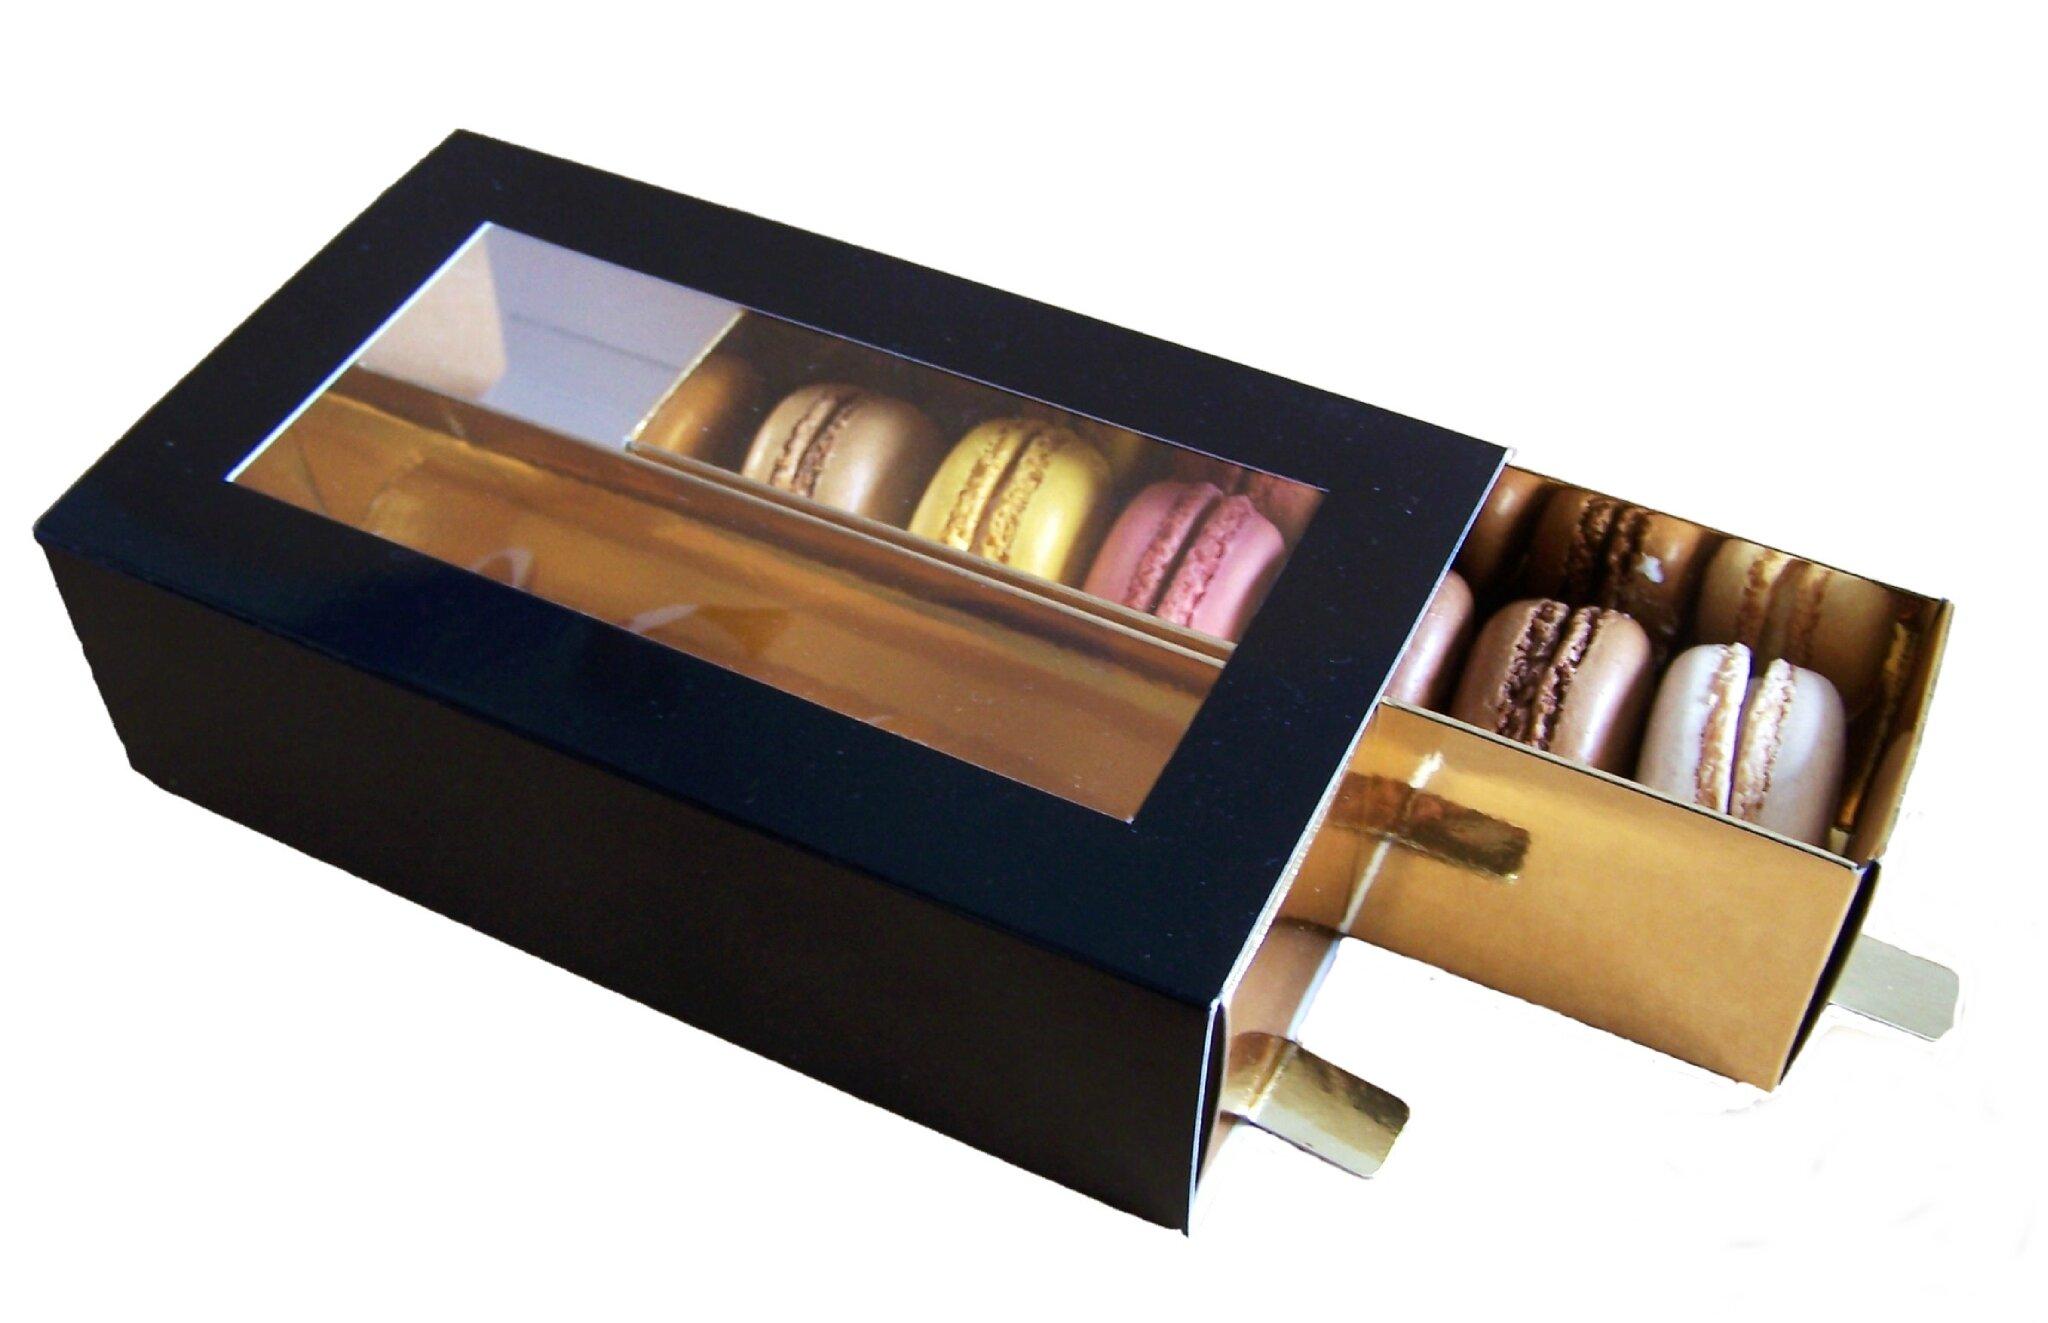 130724 Boite macarons 2 T grand format ATT2 noir or